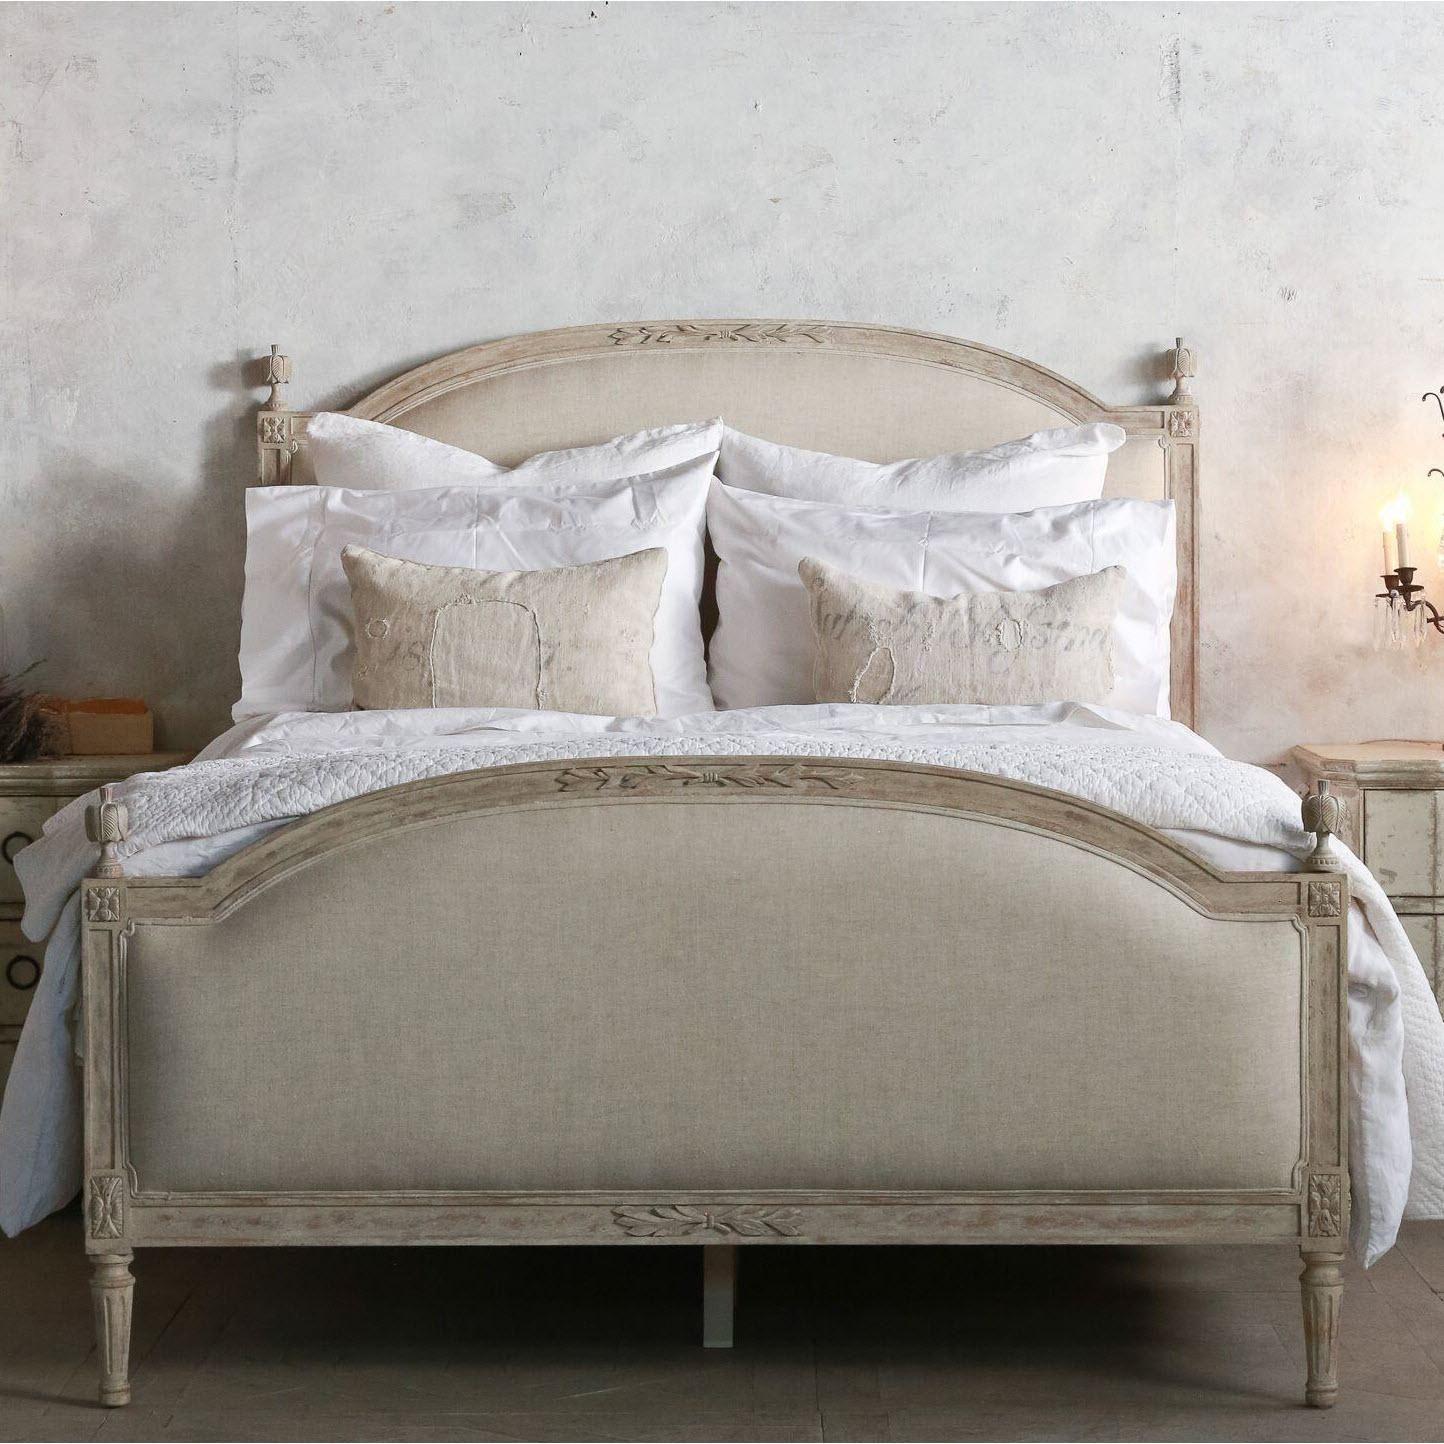 Best Eloquence S Dauphine Queen Bed With Elegant Swedish 400 x 300